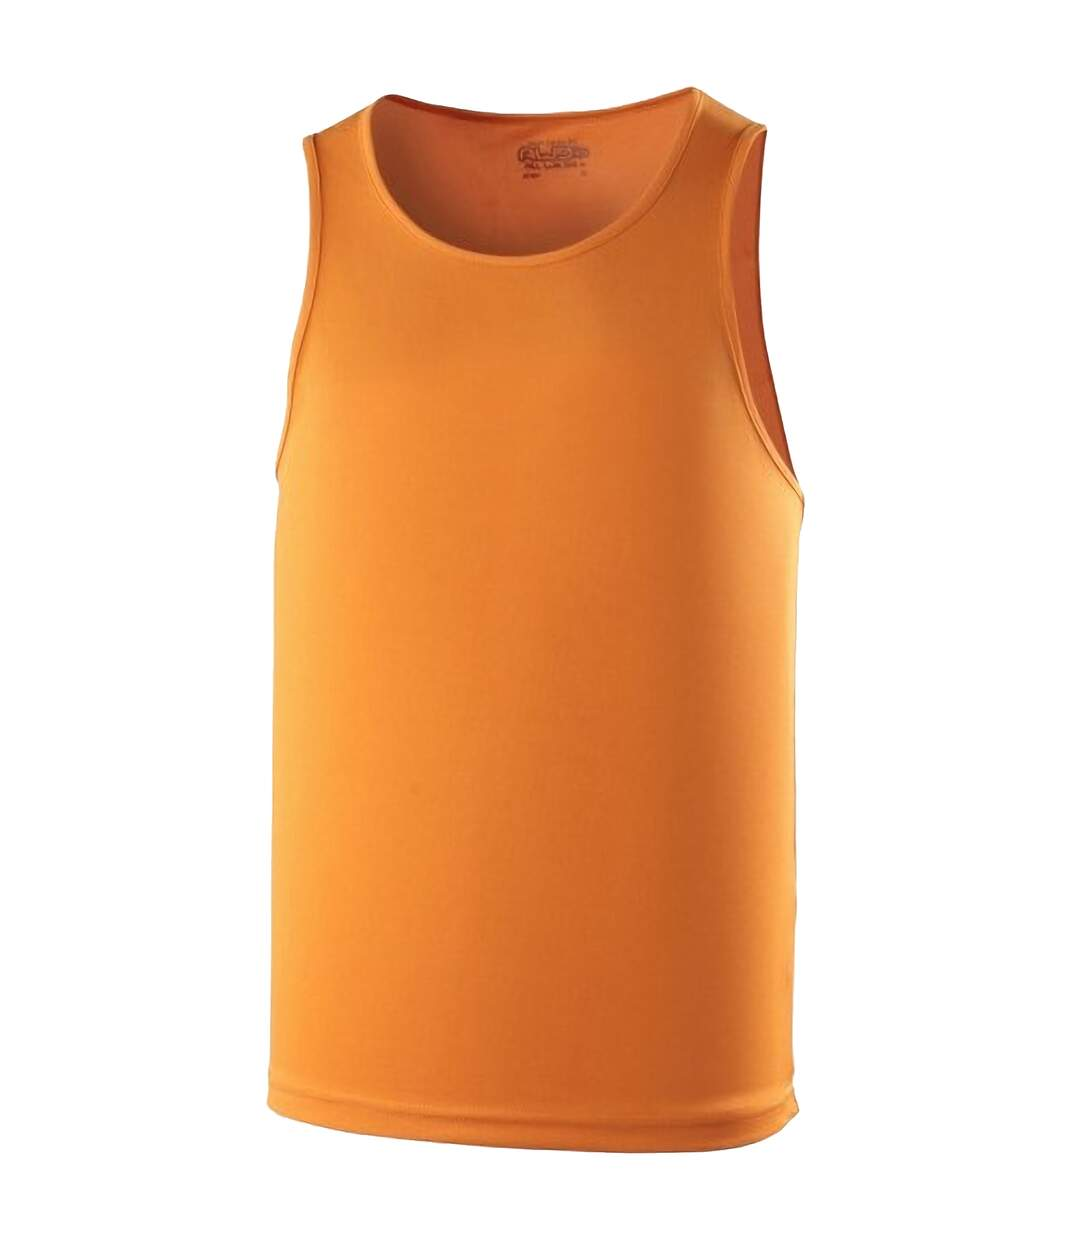 AWDis Just Cool Mens Sports Gym Plain Tank / Vest Top (Purple) - UTRW687